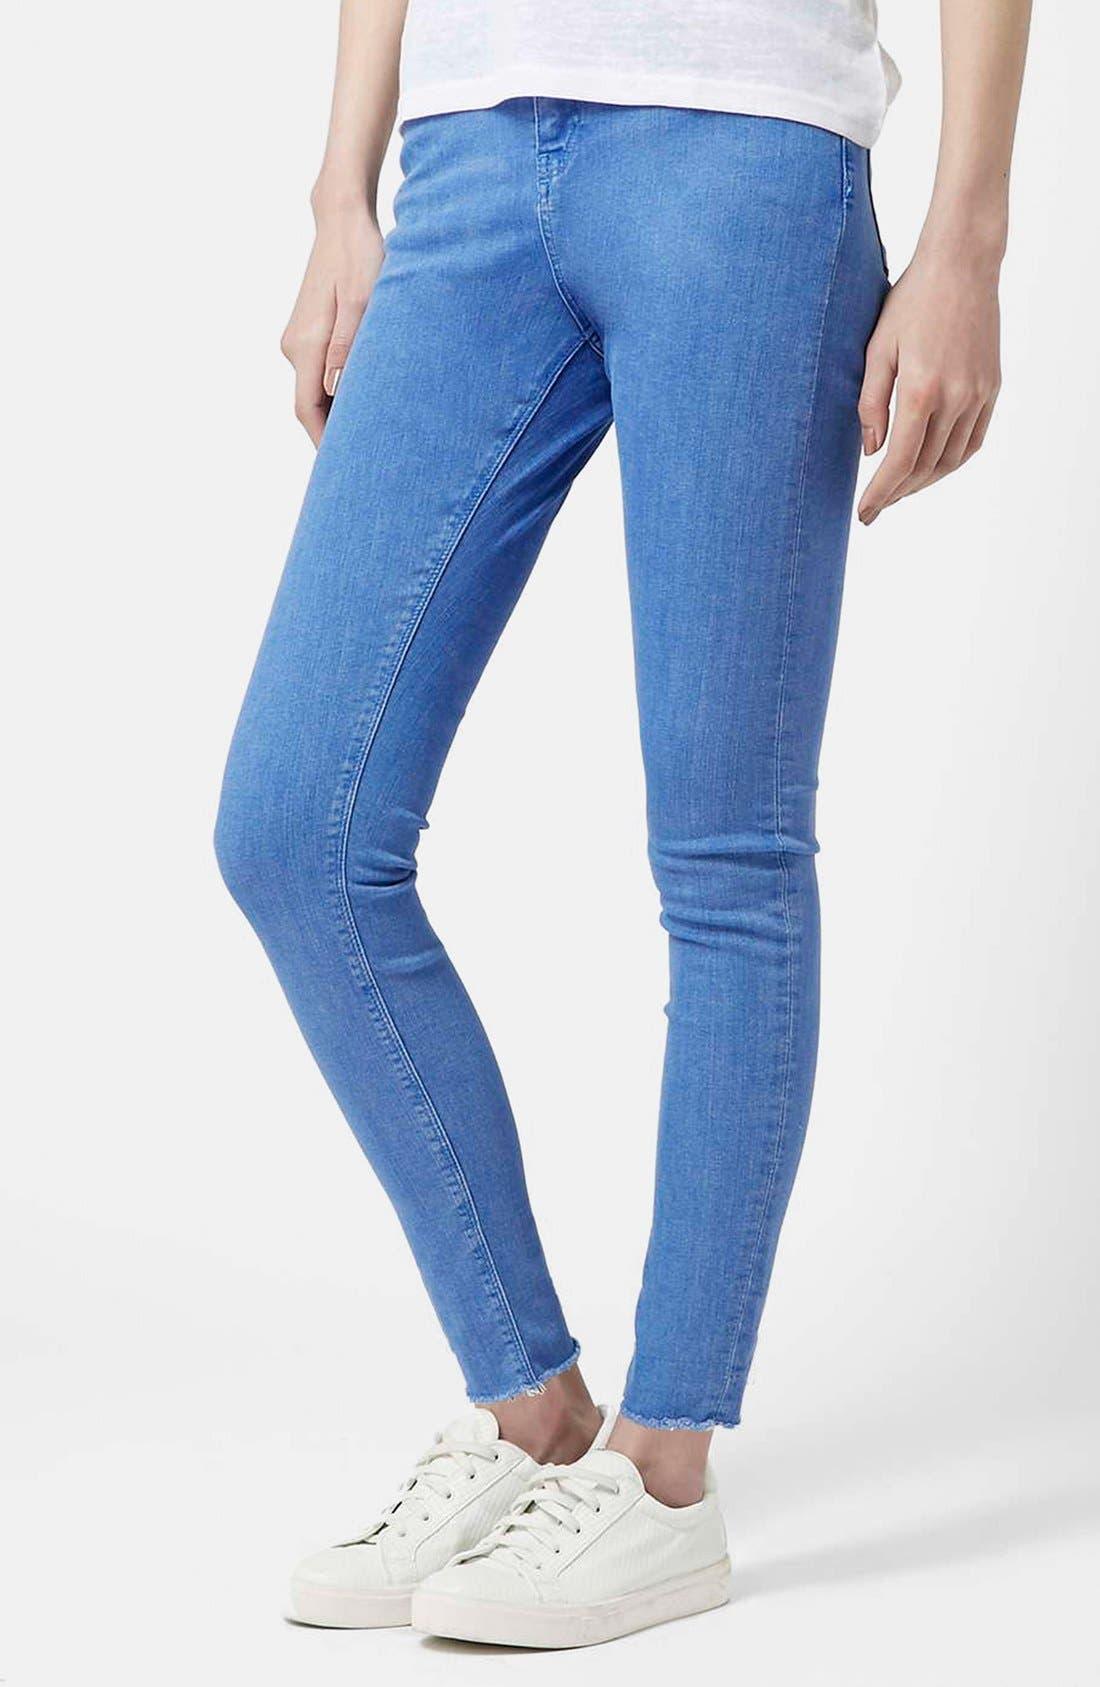 Main Image - Topshop Moto 'Jamie' High Waist Skinny Jeans (Blue) (Short)